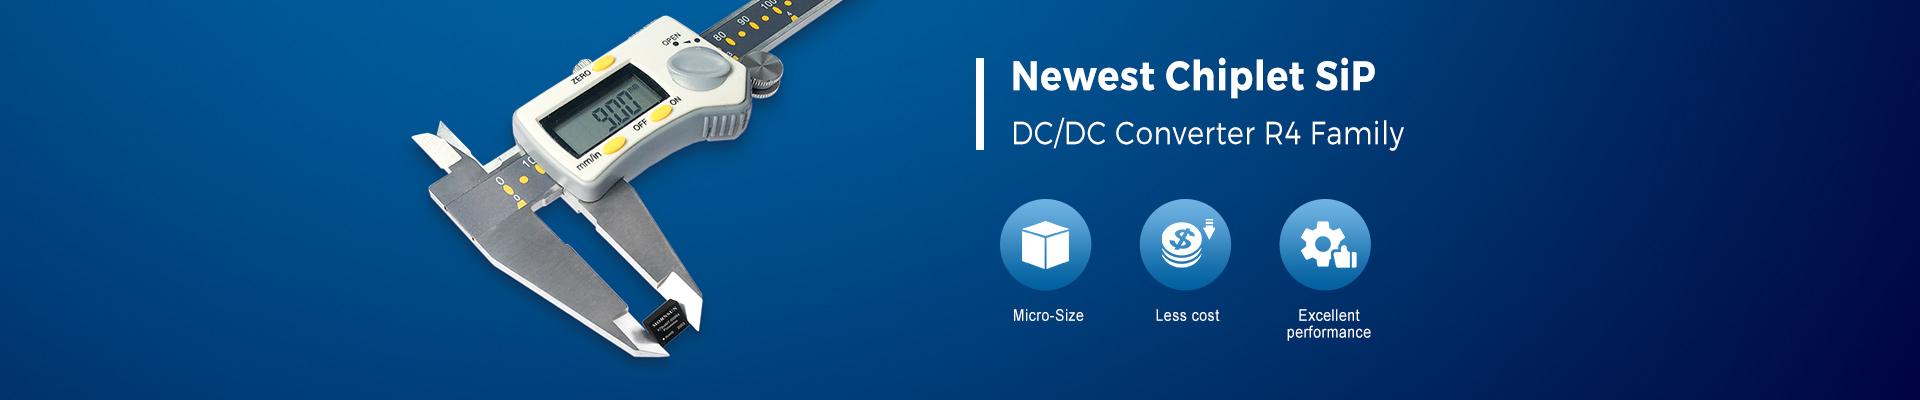 MORNSUN Chiplet SiP DC DC Converter